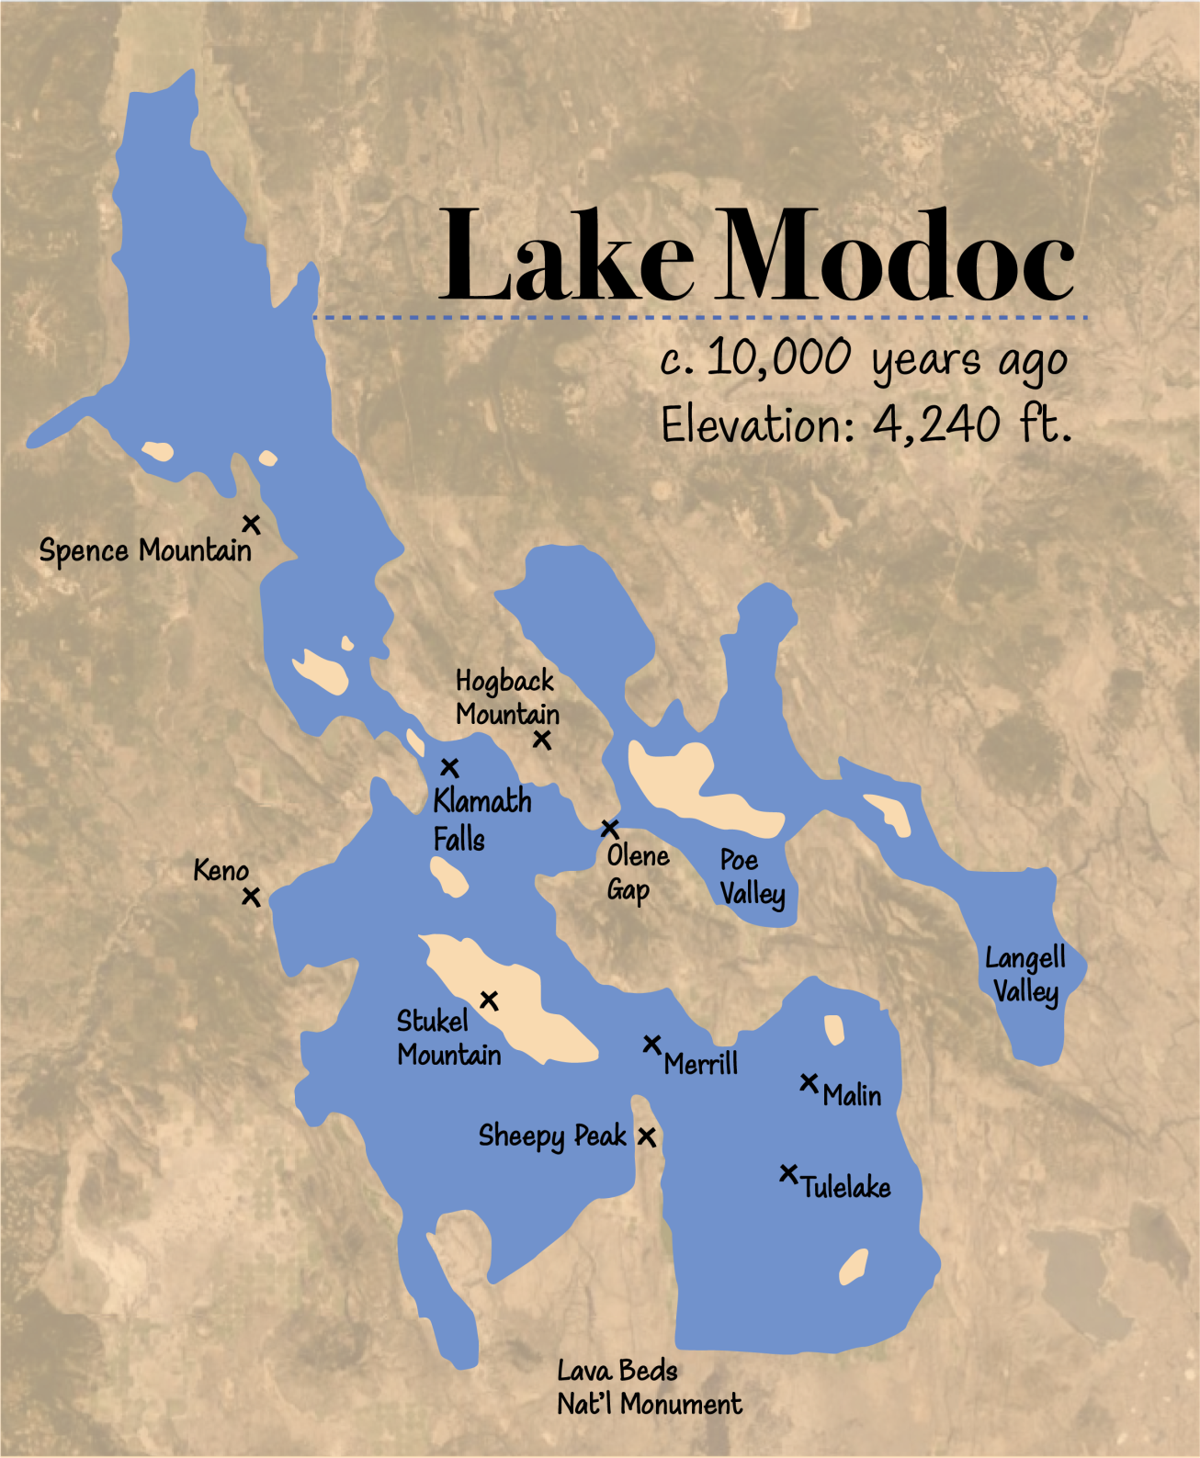 lake modoc.png